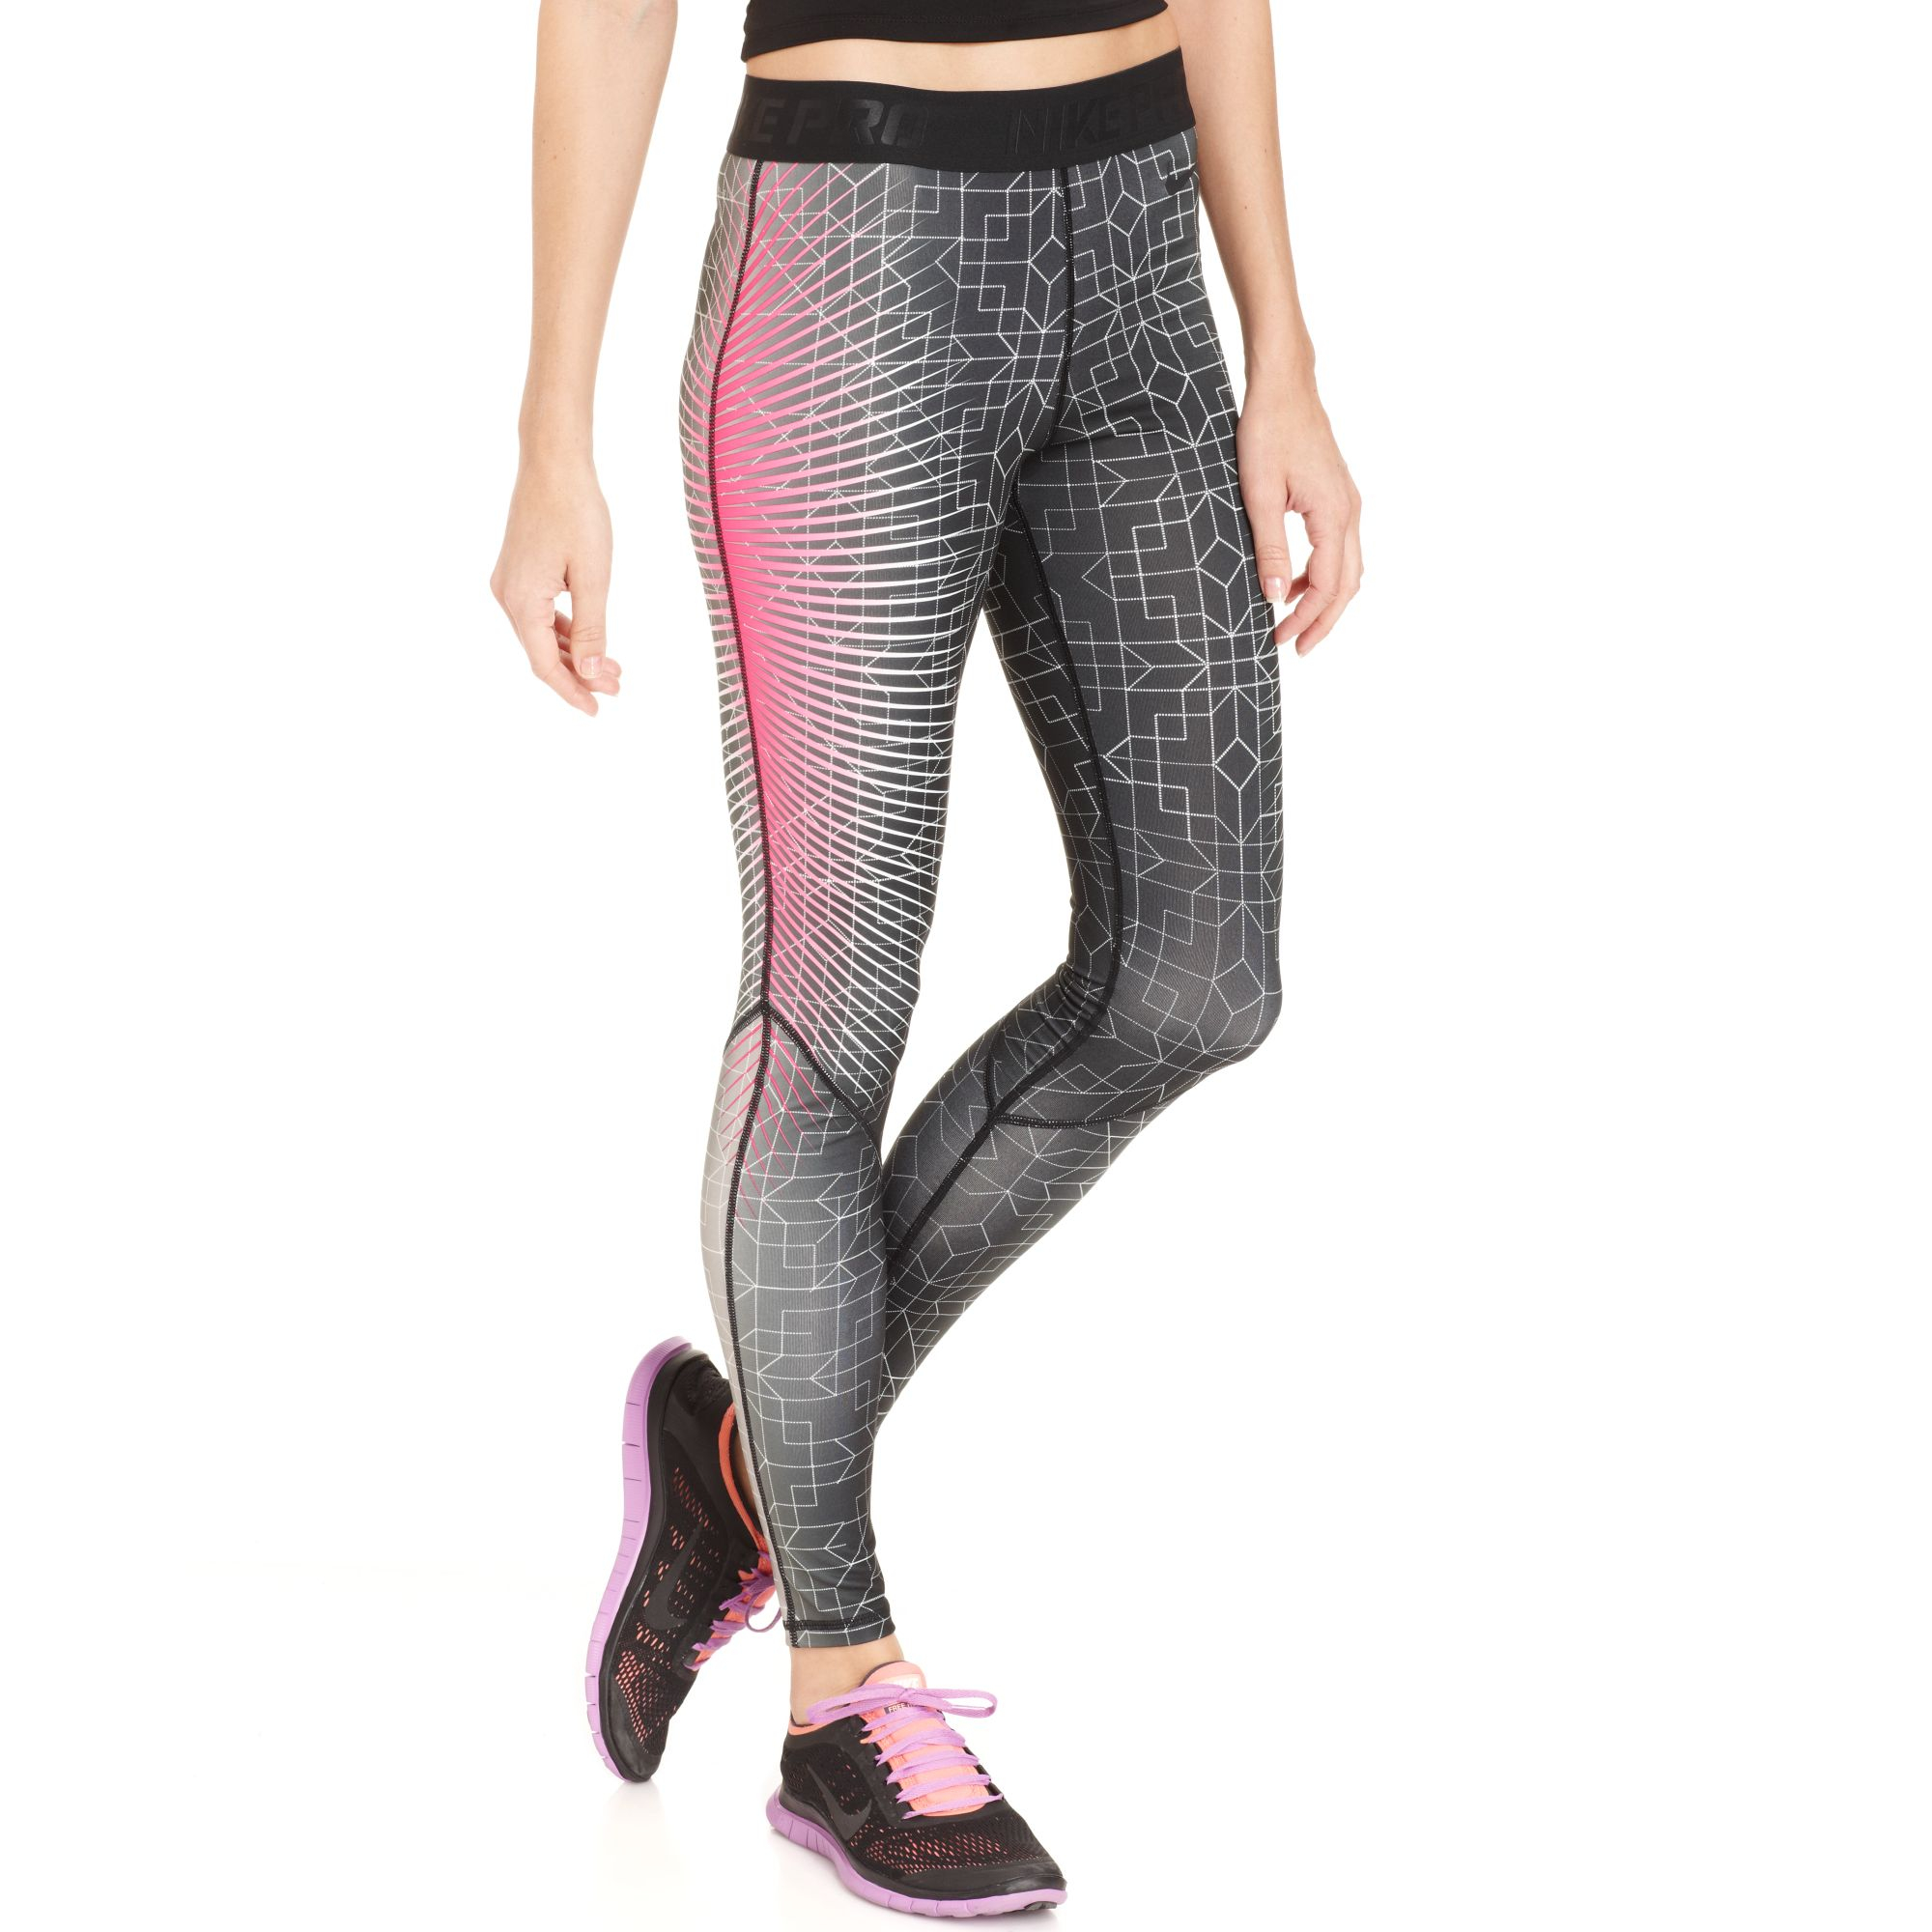 e9ed5f21d9f4b Nike Printed Leggings in Pink - Lyst